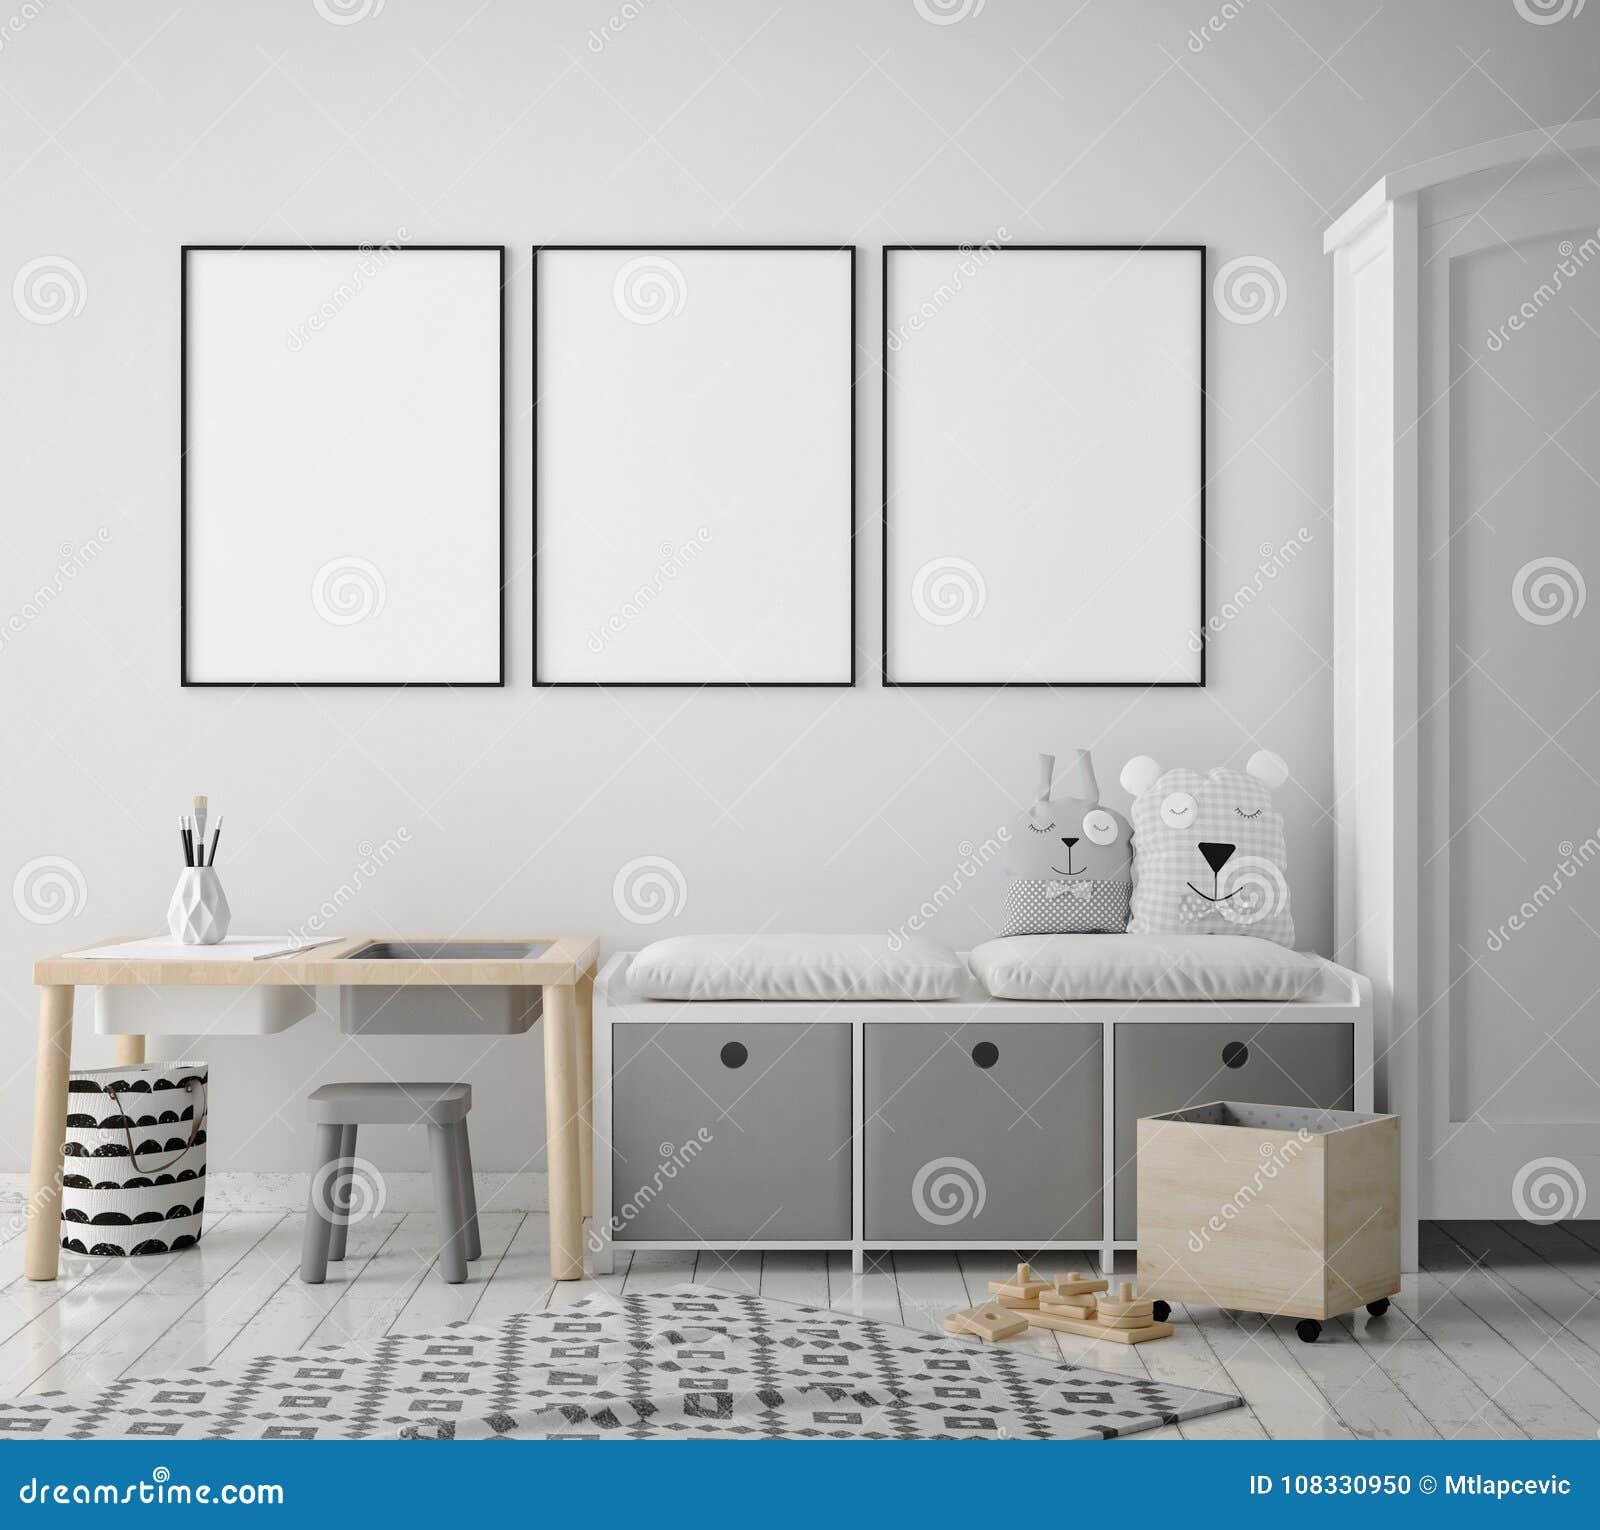 Mock up poster frames in children bedroom, scandinavian style interior background, 3D render